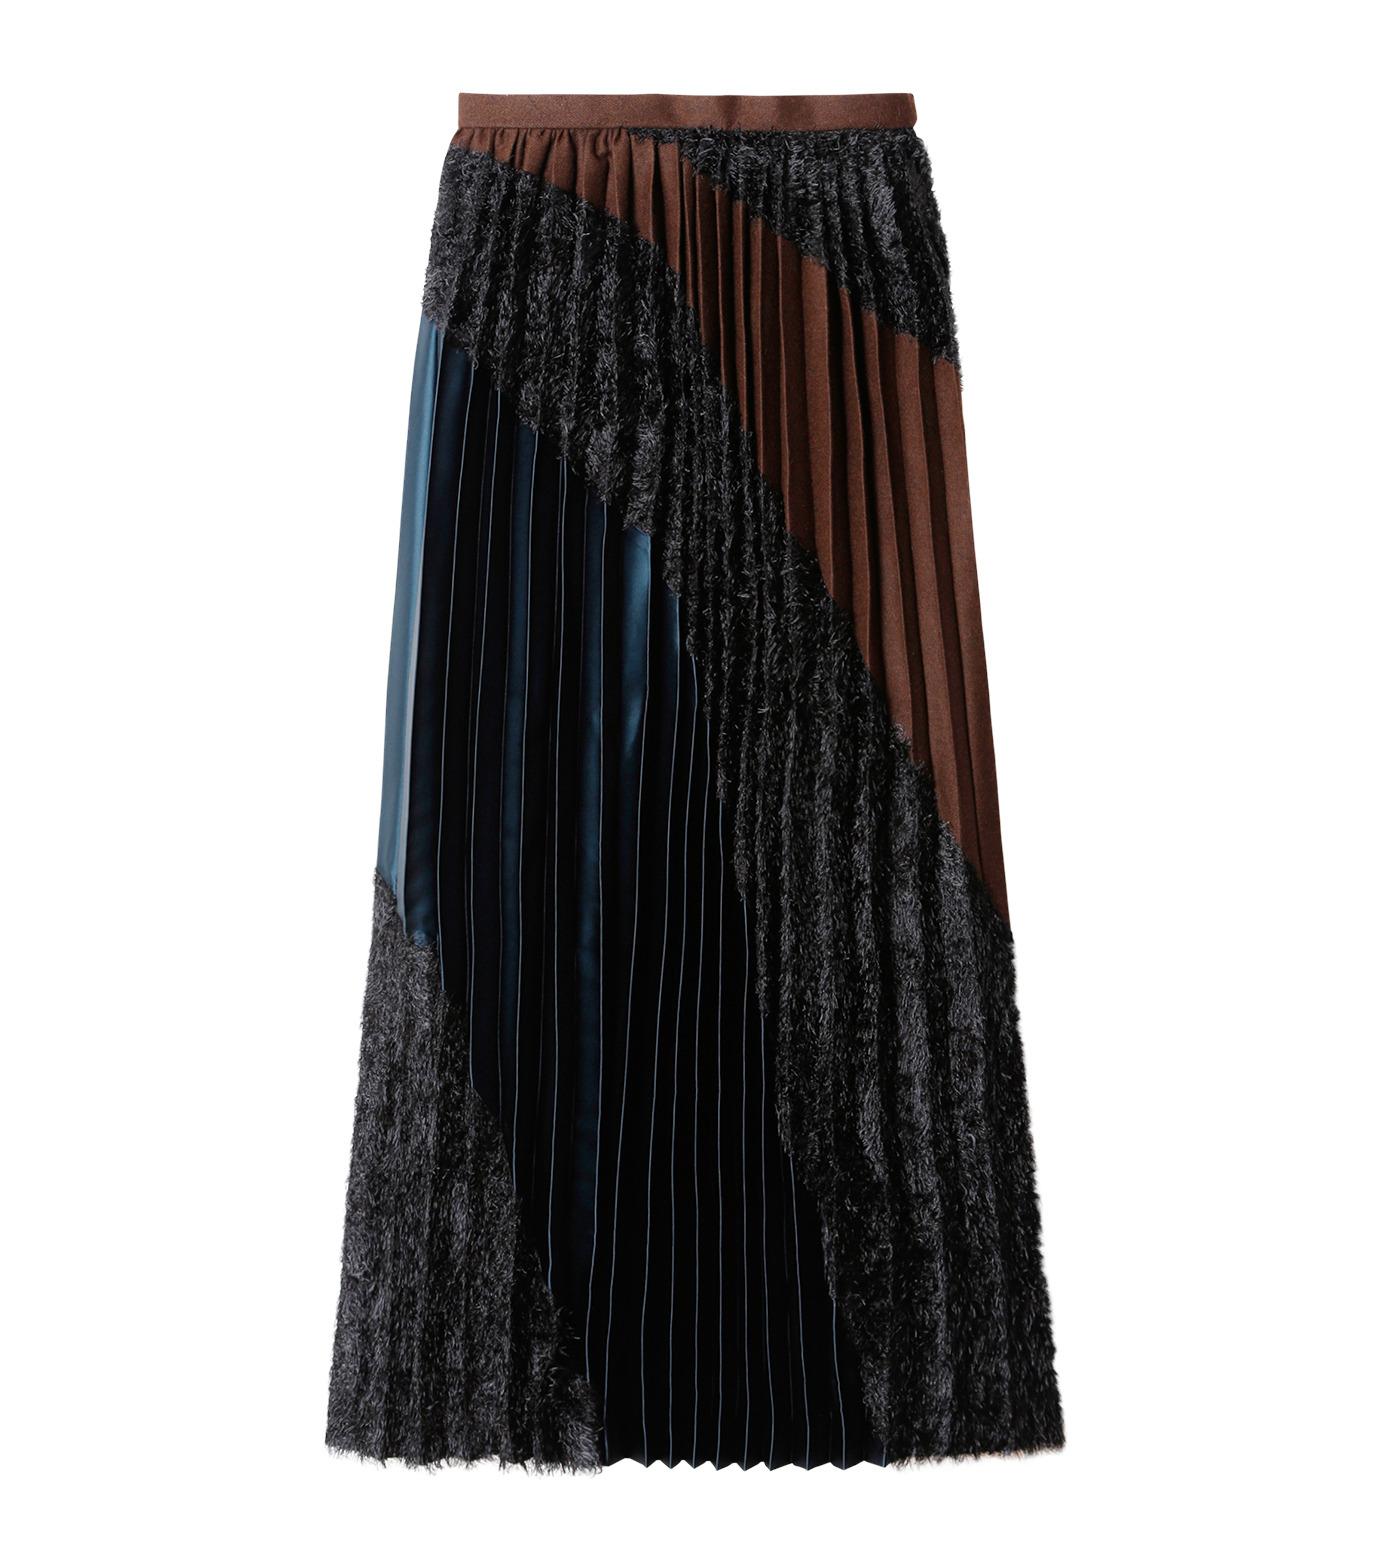 KOLOR(カラー)のLong Pleated Skirt Mixed Jacquard-BLACK(スカート/skirt)-16WCL-S03129-13 拡大詳細画像4